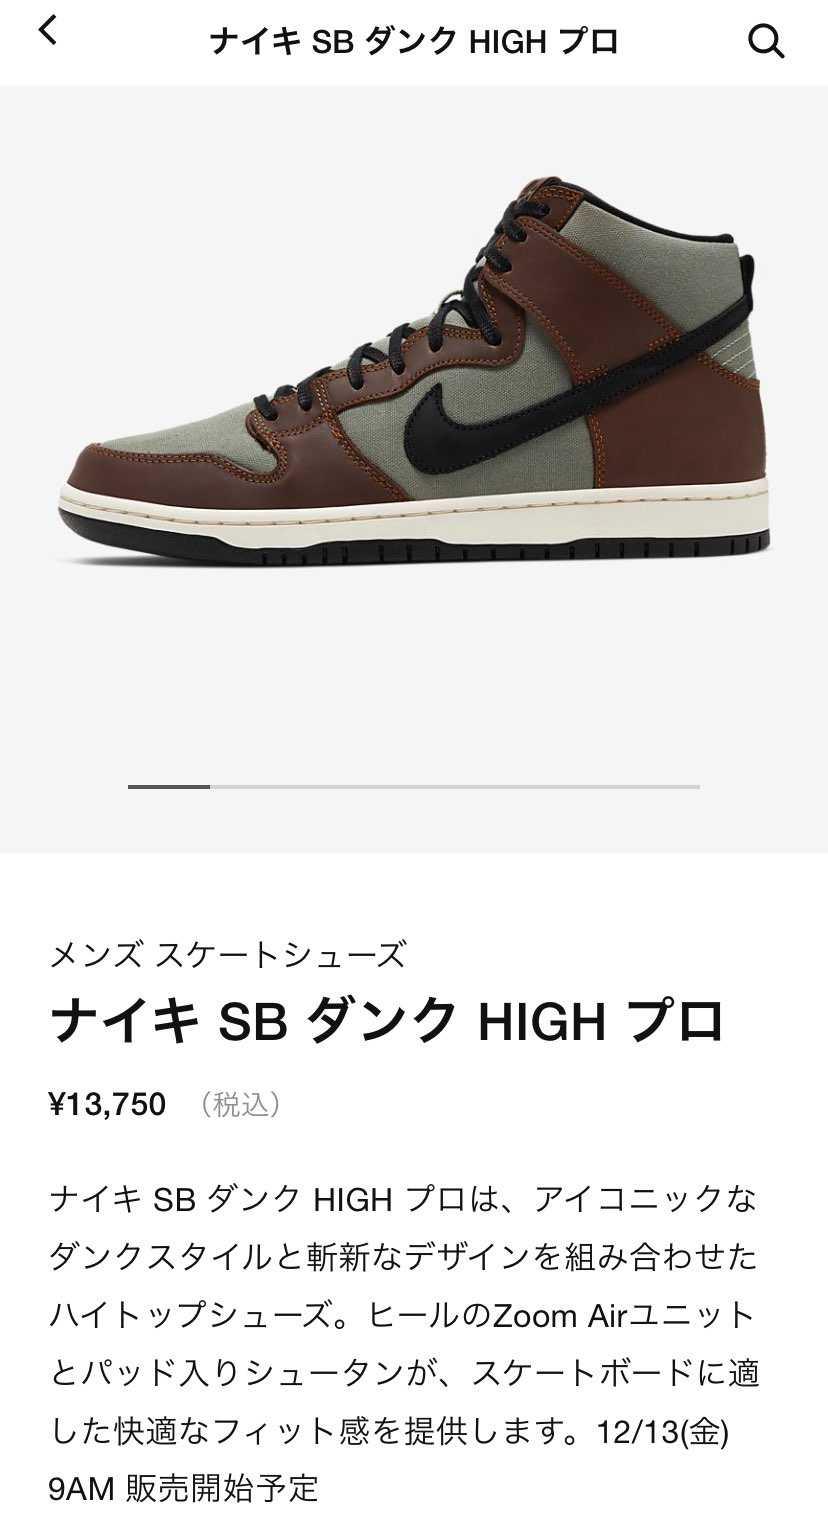 NIKE .com  …13日 am9:00発売予定💦💦